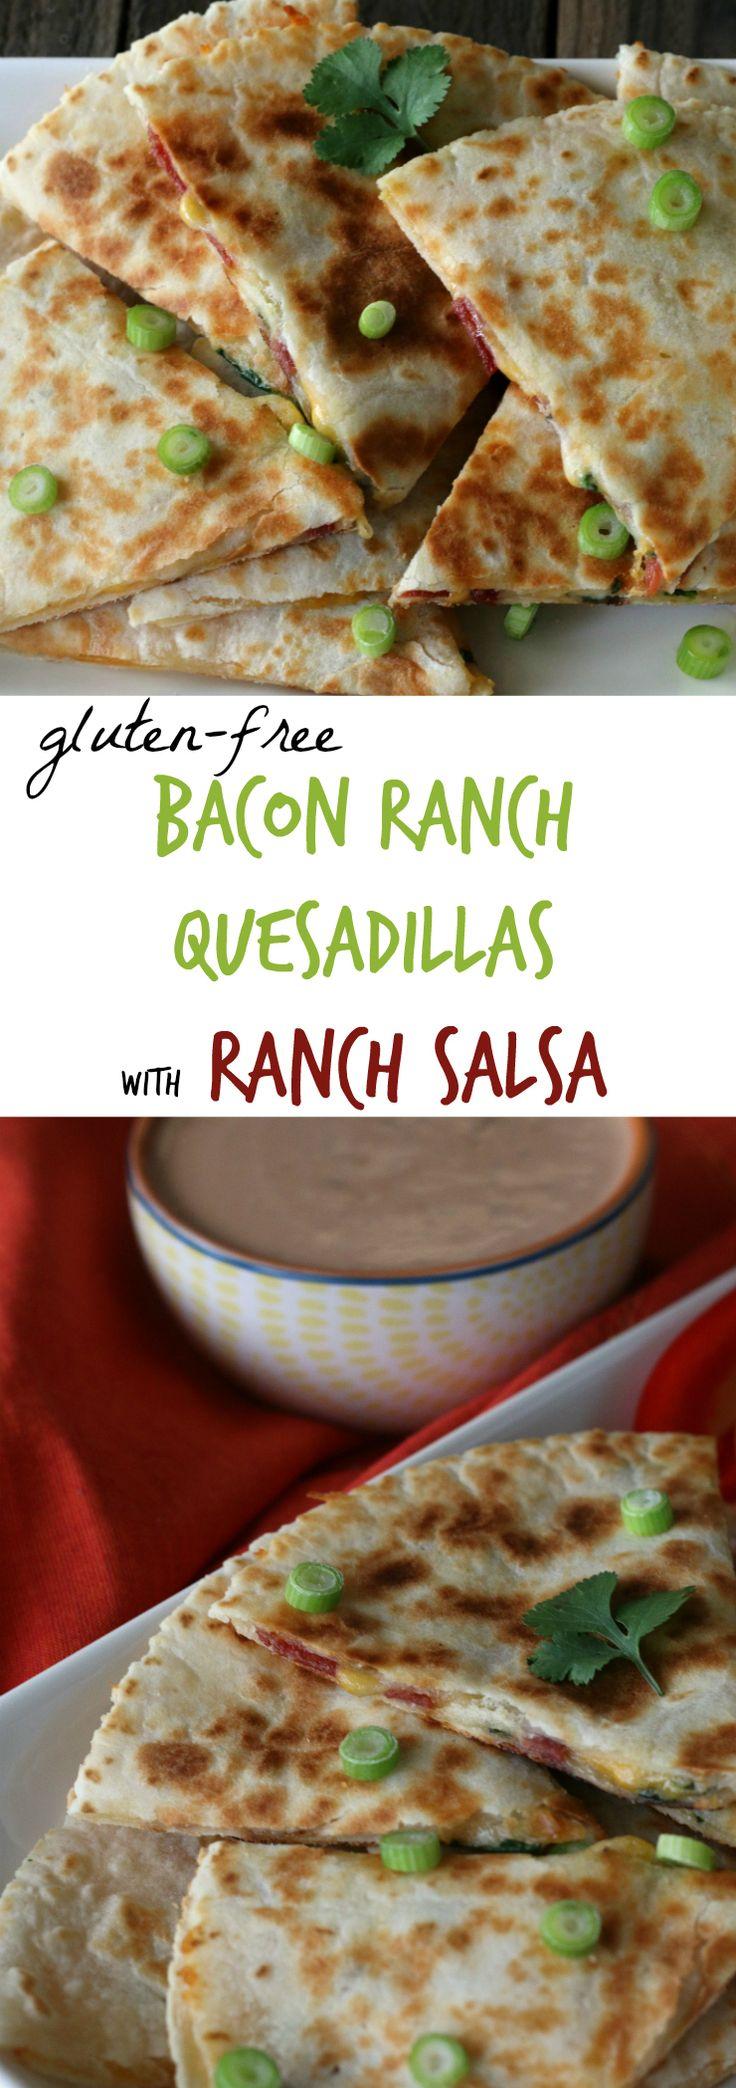 Gluten-free Bacon Ranch Quesadillas with Ranch Salsa. Easy weeknight dinner recipe!